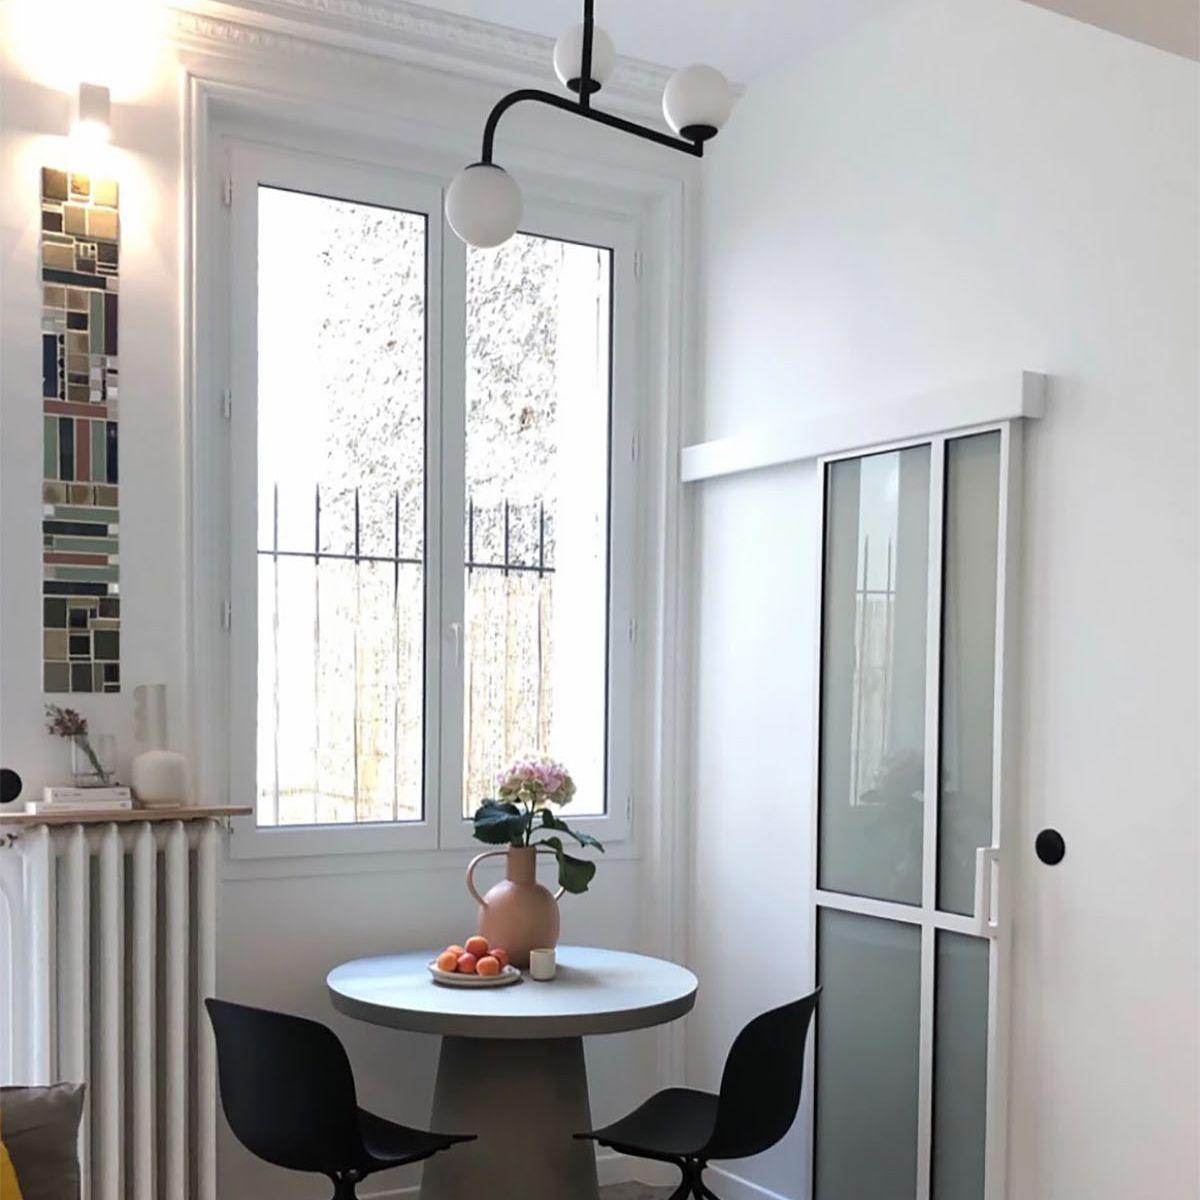 Boulevard Arago apartment renovation Studio Beau Faire dining table